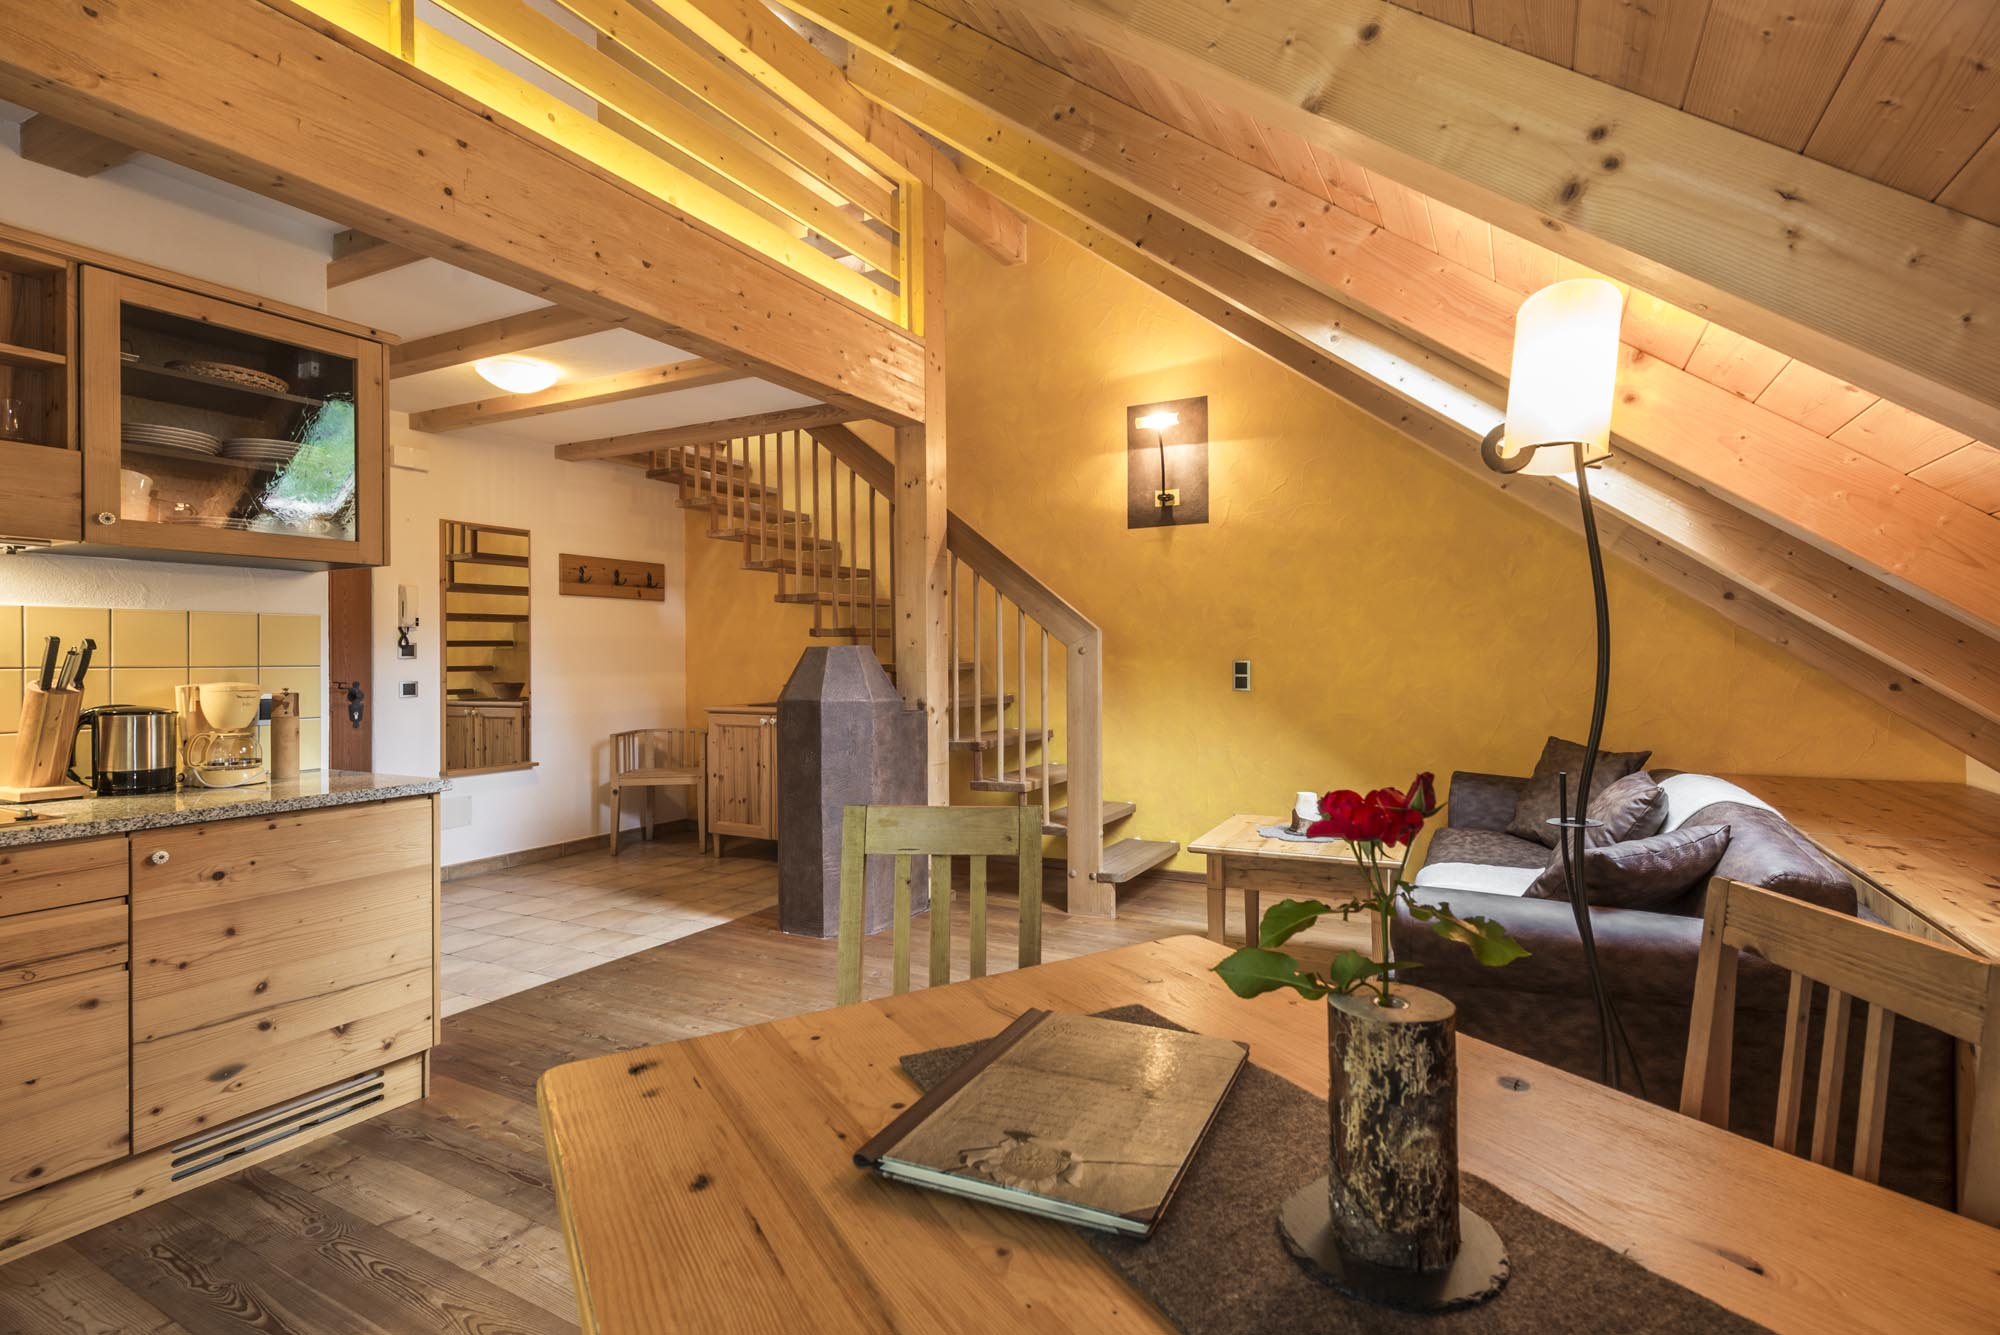 Mansarde Waldrausch II - Appartments in the Ahrntal: Mair zu Hof in Sand in Taufers / South Tyrol